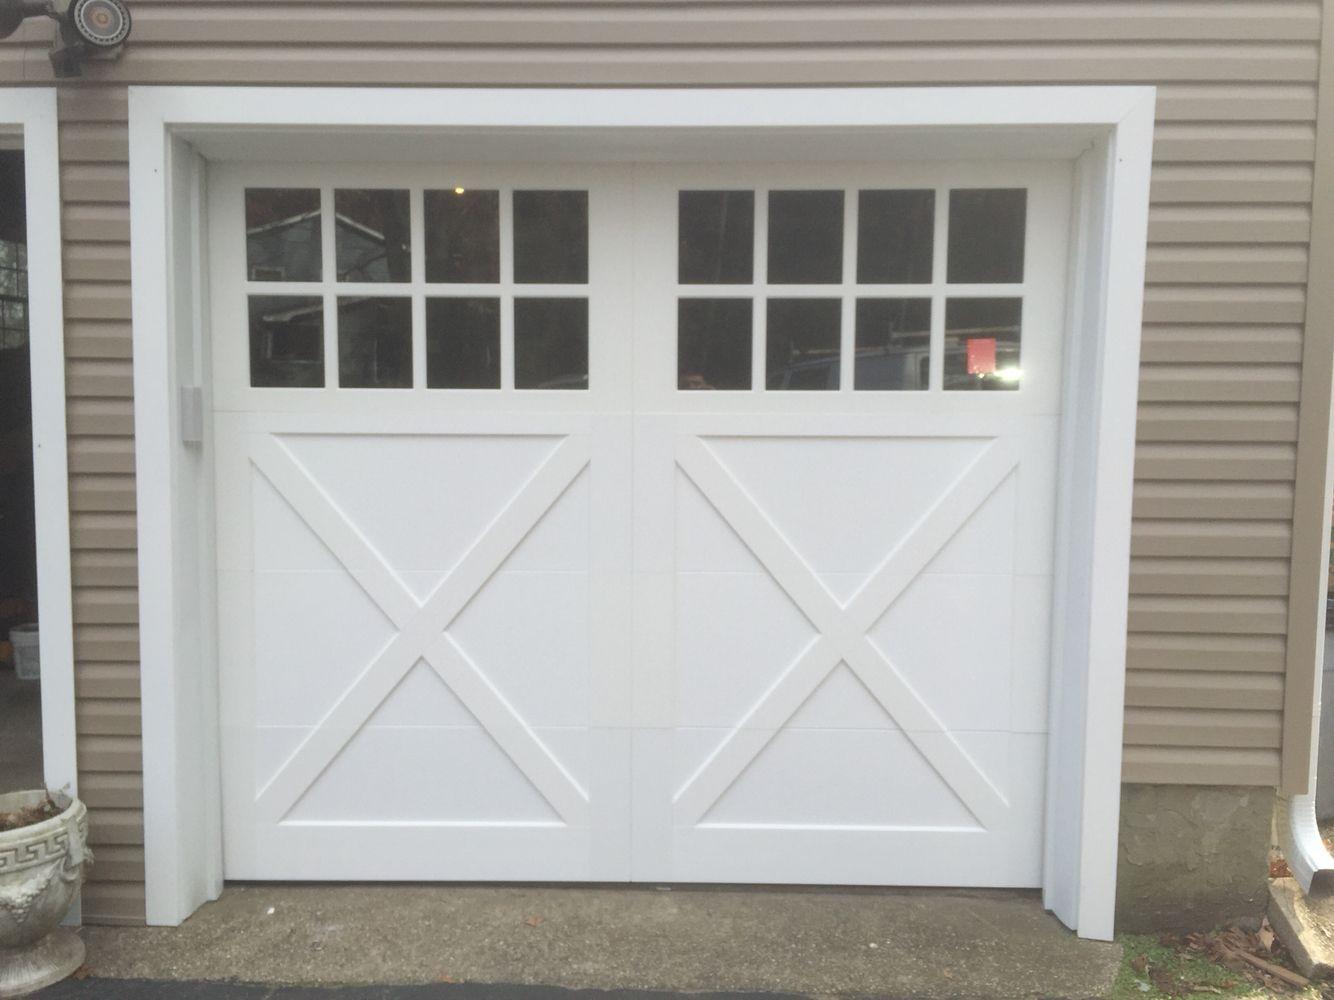 Fimbel Ads American Legends Collection Carriage Garage Doors Outdoor Decor Decor